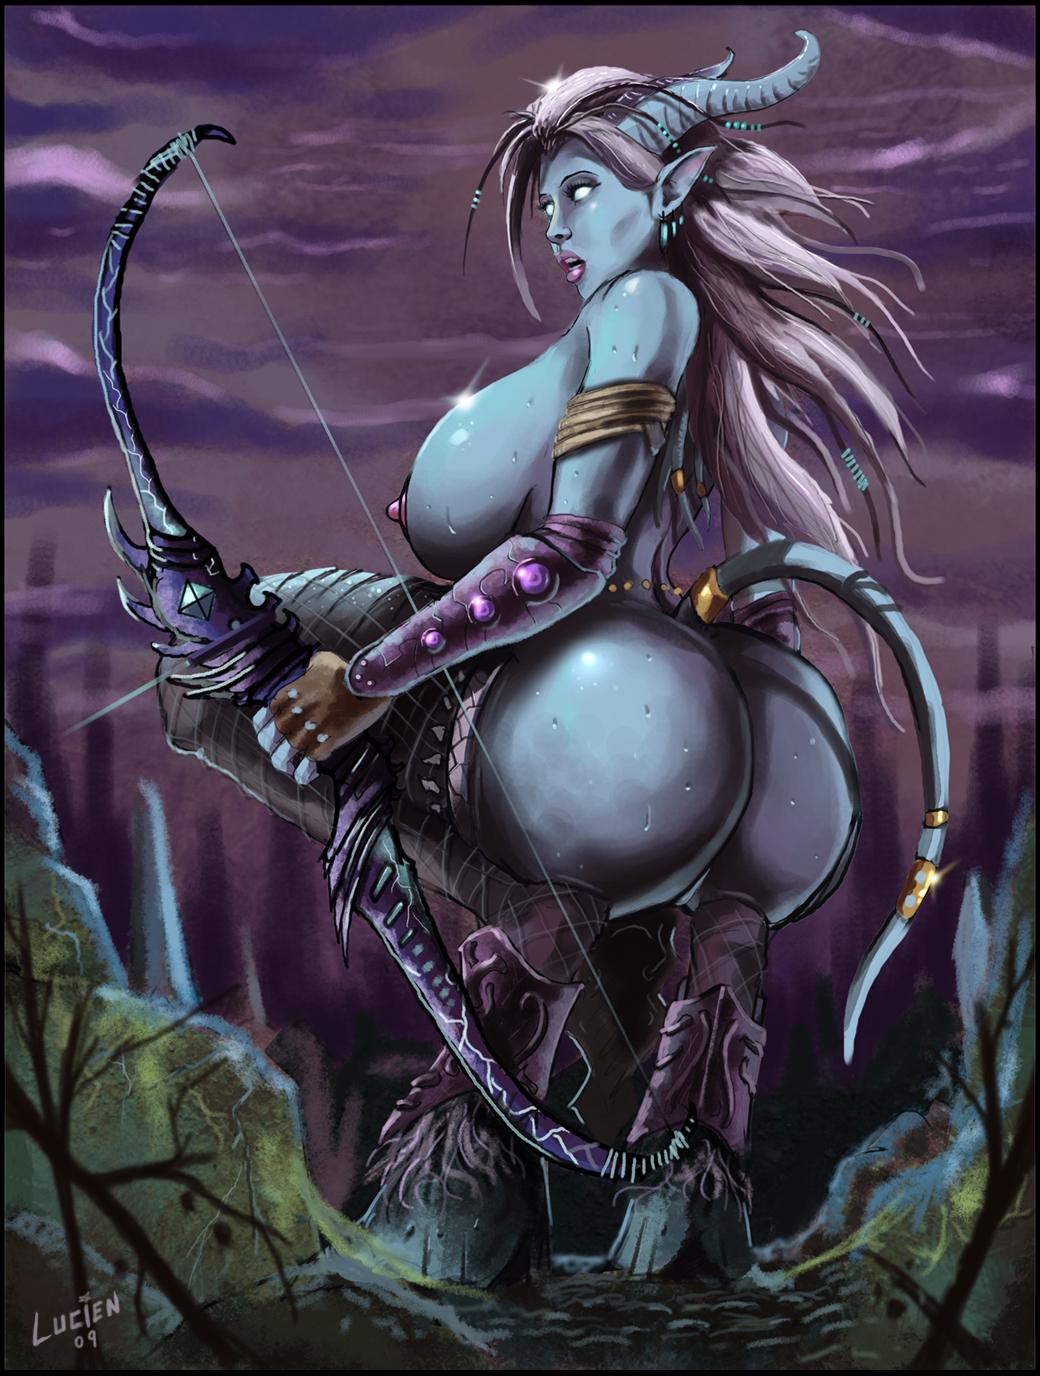 yorkshire hunter cheadle x hunter Tales of demons and gods shen xiu